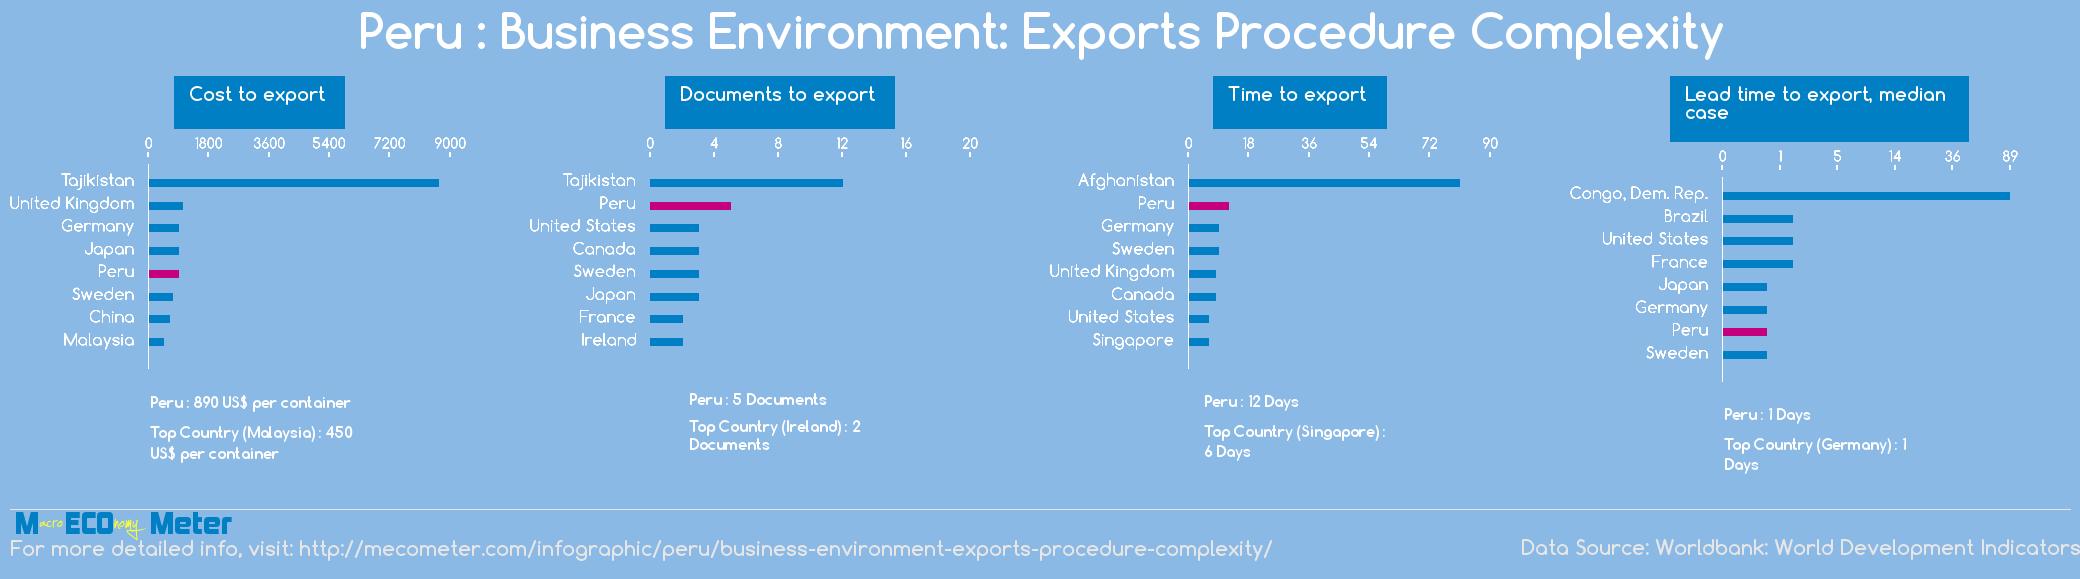 Peru : Business Environment: Exports Procedure Complexity